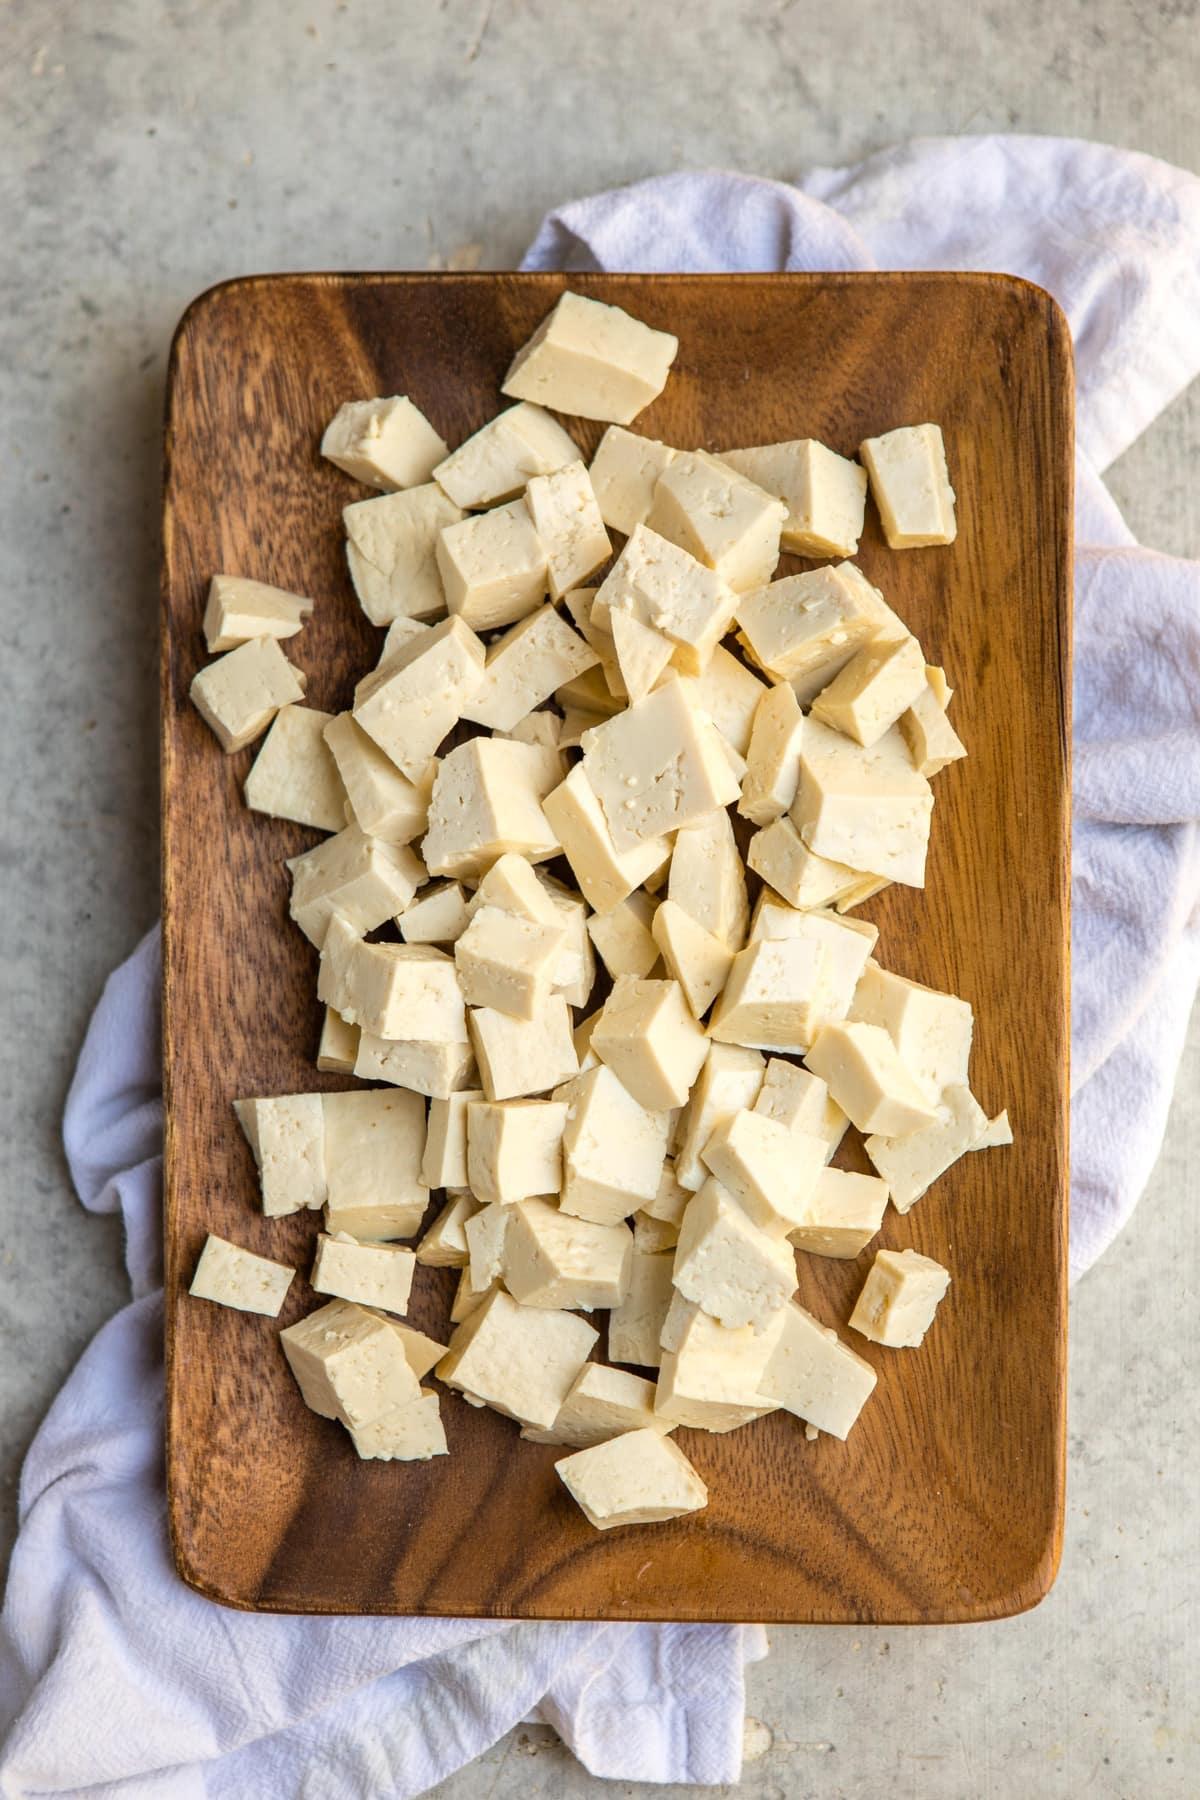 pressed and chopped medium firm tofu on wood rectangular plate